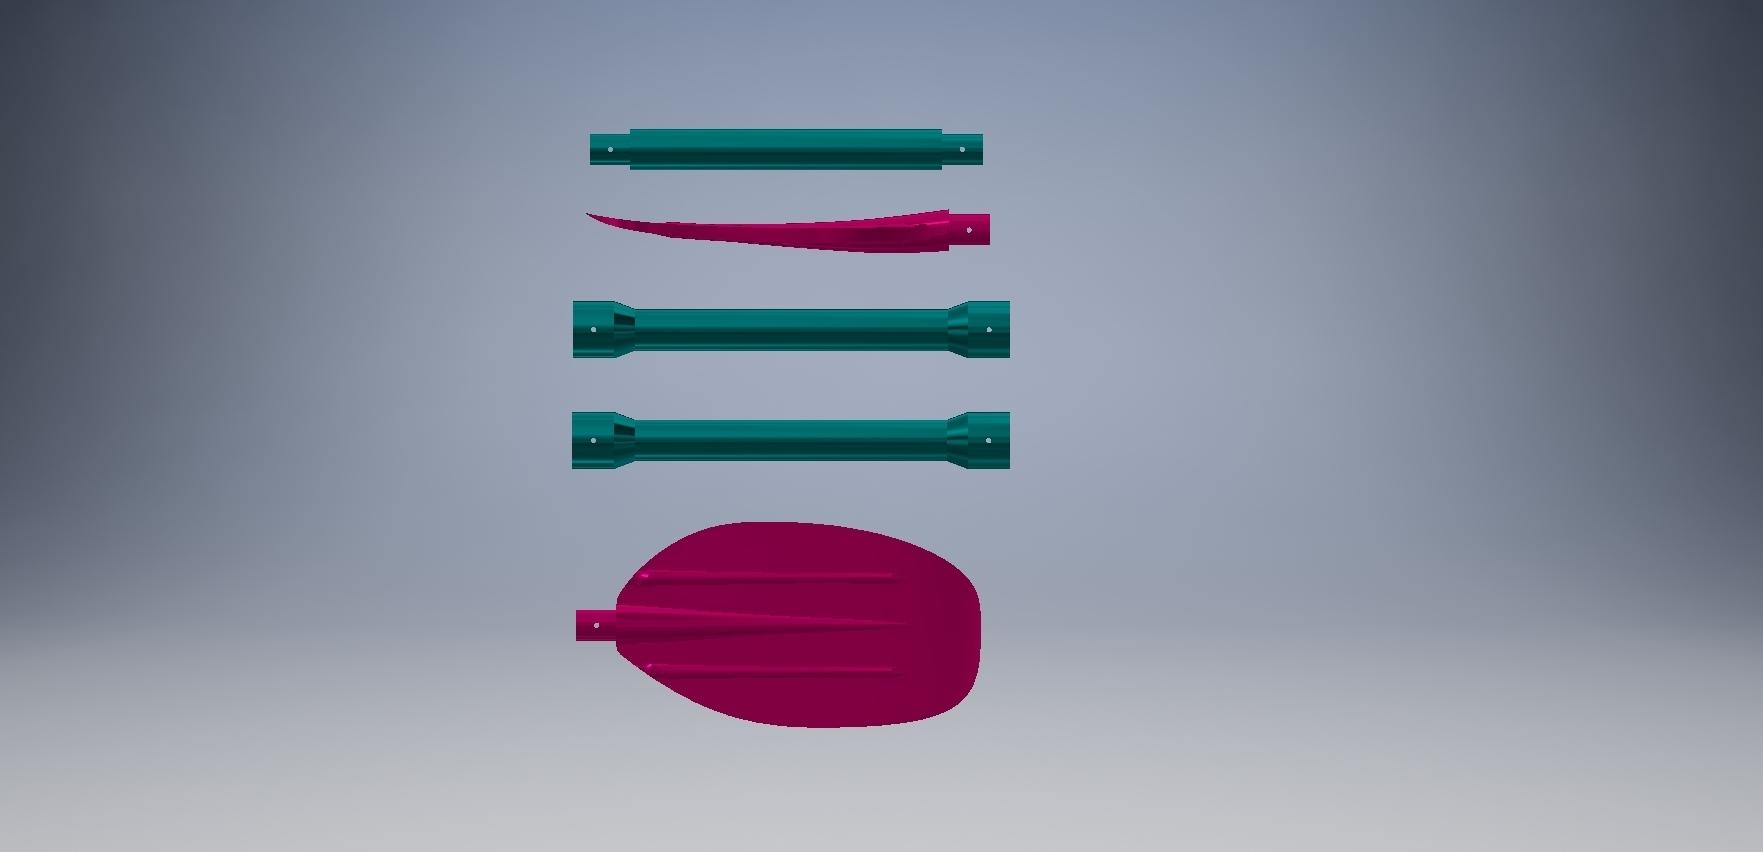 555666.jpg Download free STL file Paddle/Весло • 3D printing design, MaKs